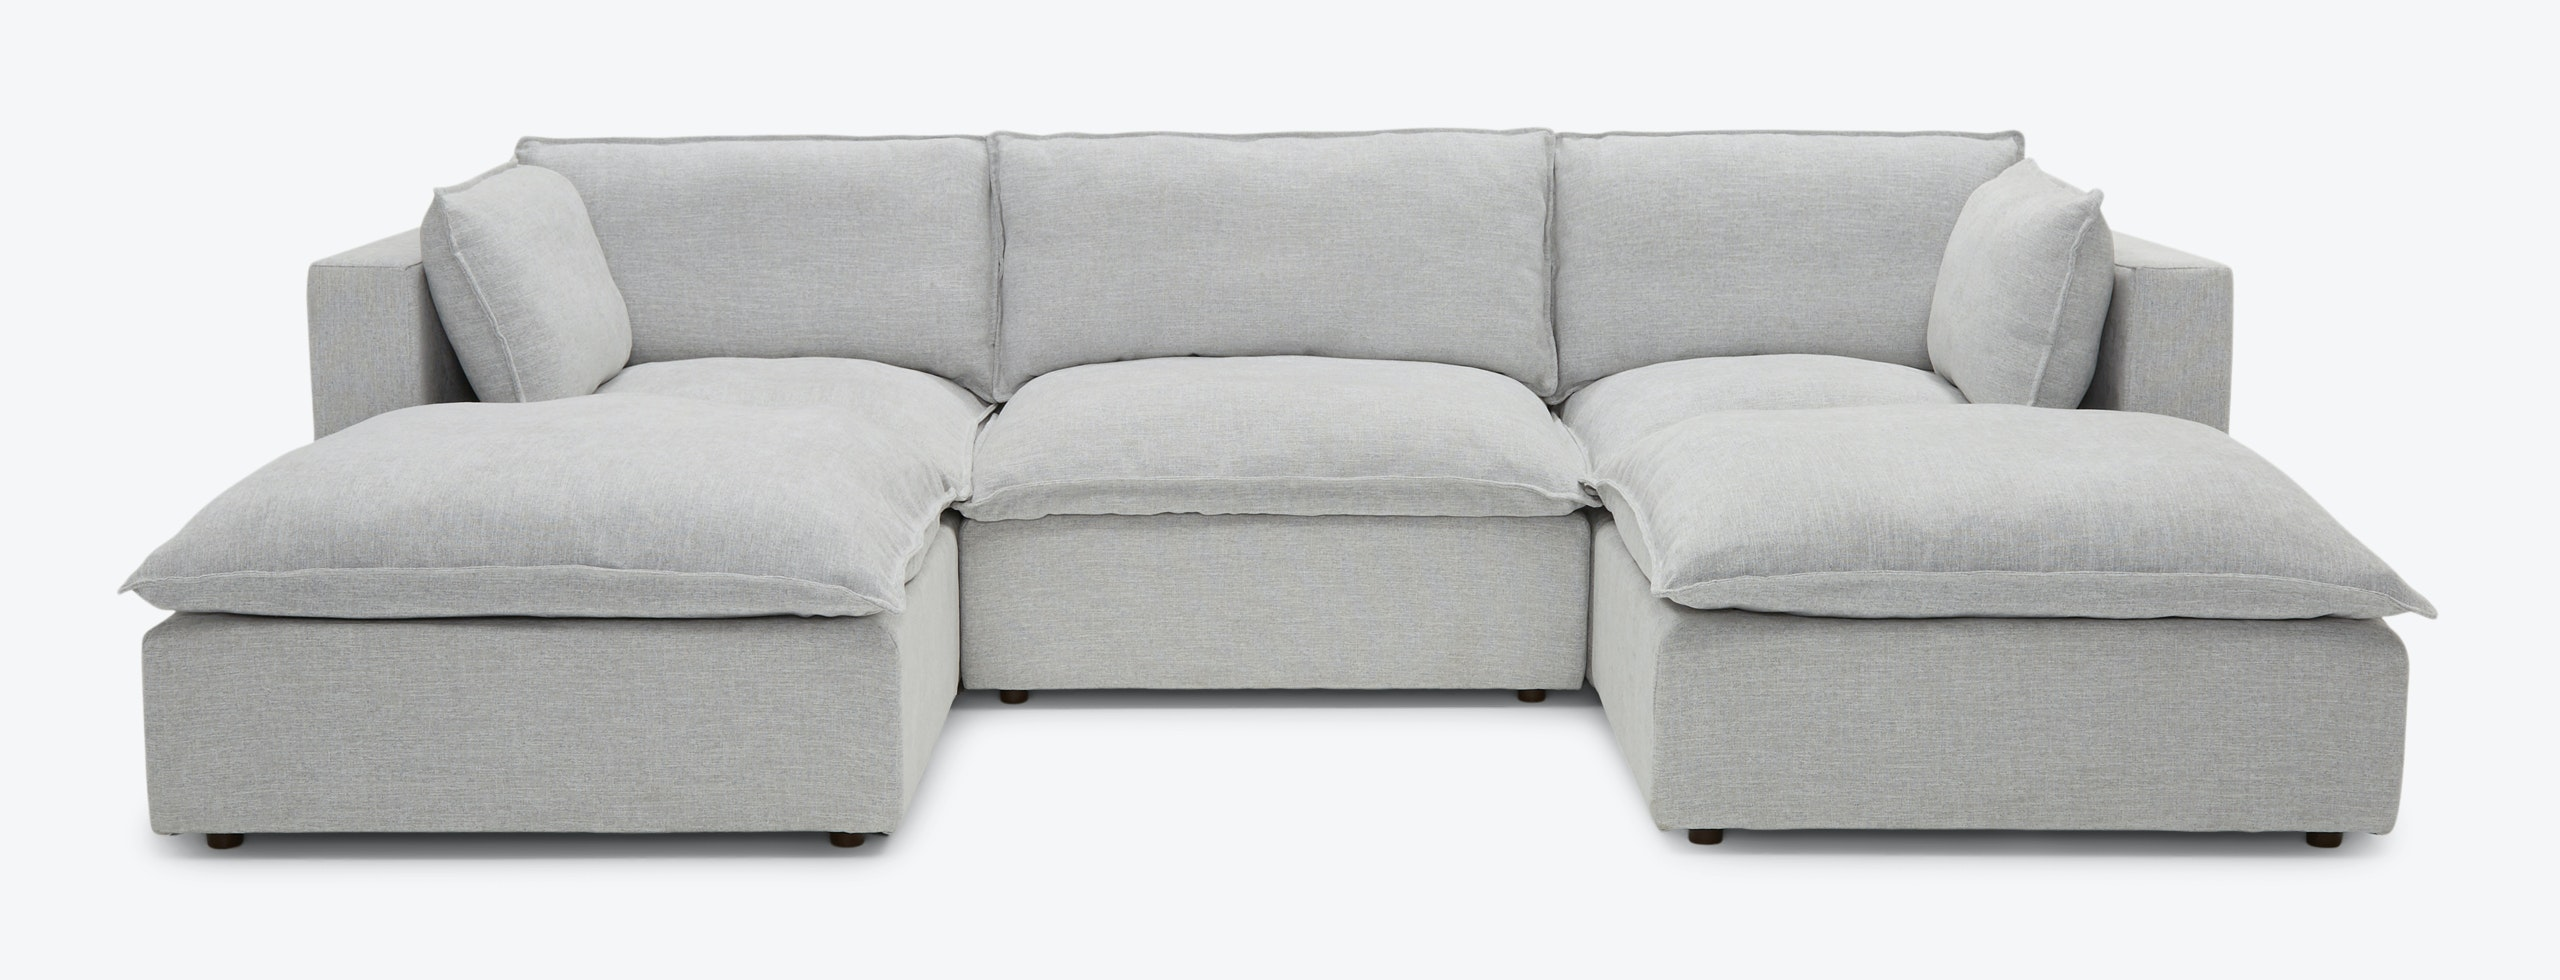 haine modular u chaise sectional